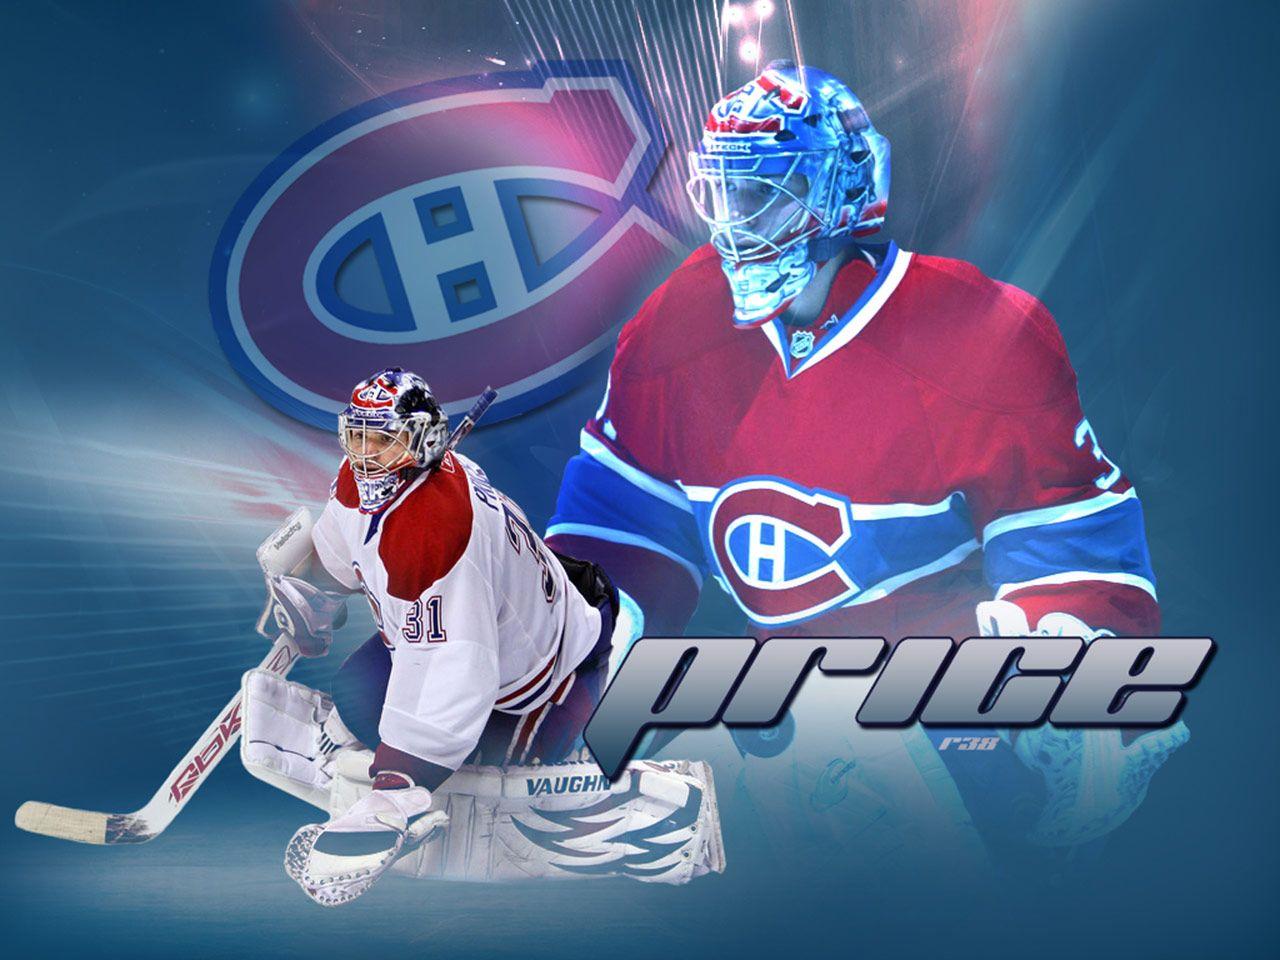 Carey-Price-Montreal-Canadiens-Wallpaper.jpeg 1 280  960 pixels